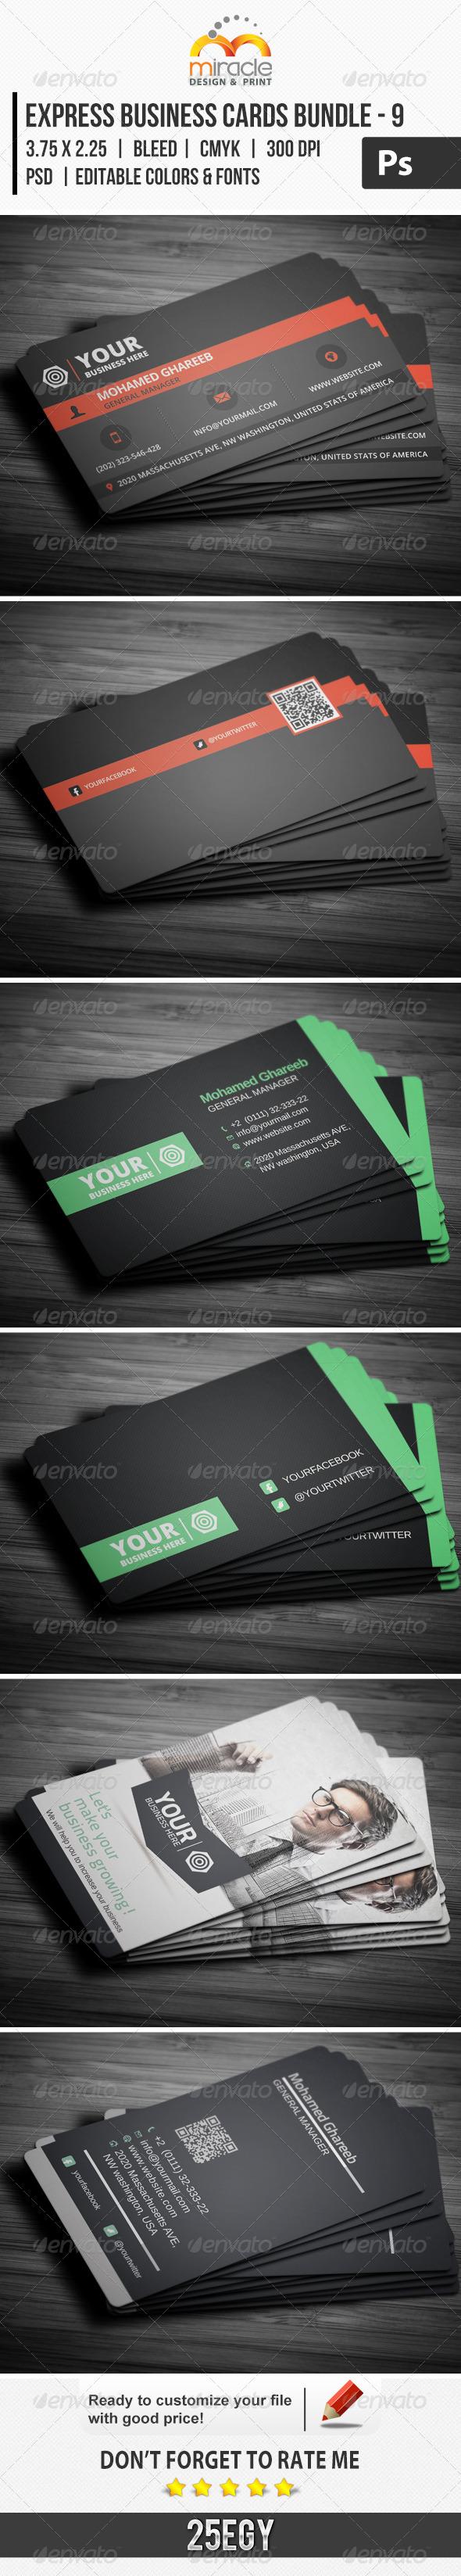 GraphicRiver Express Business Cards Bundle 9 6539358